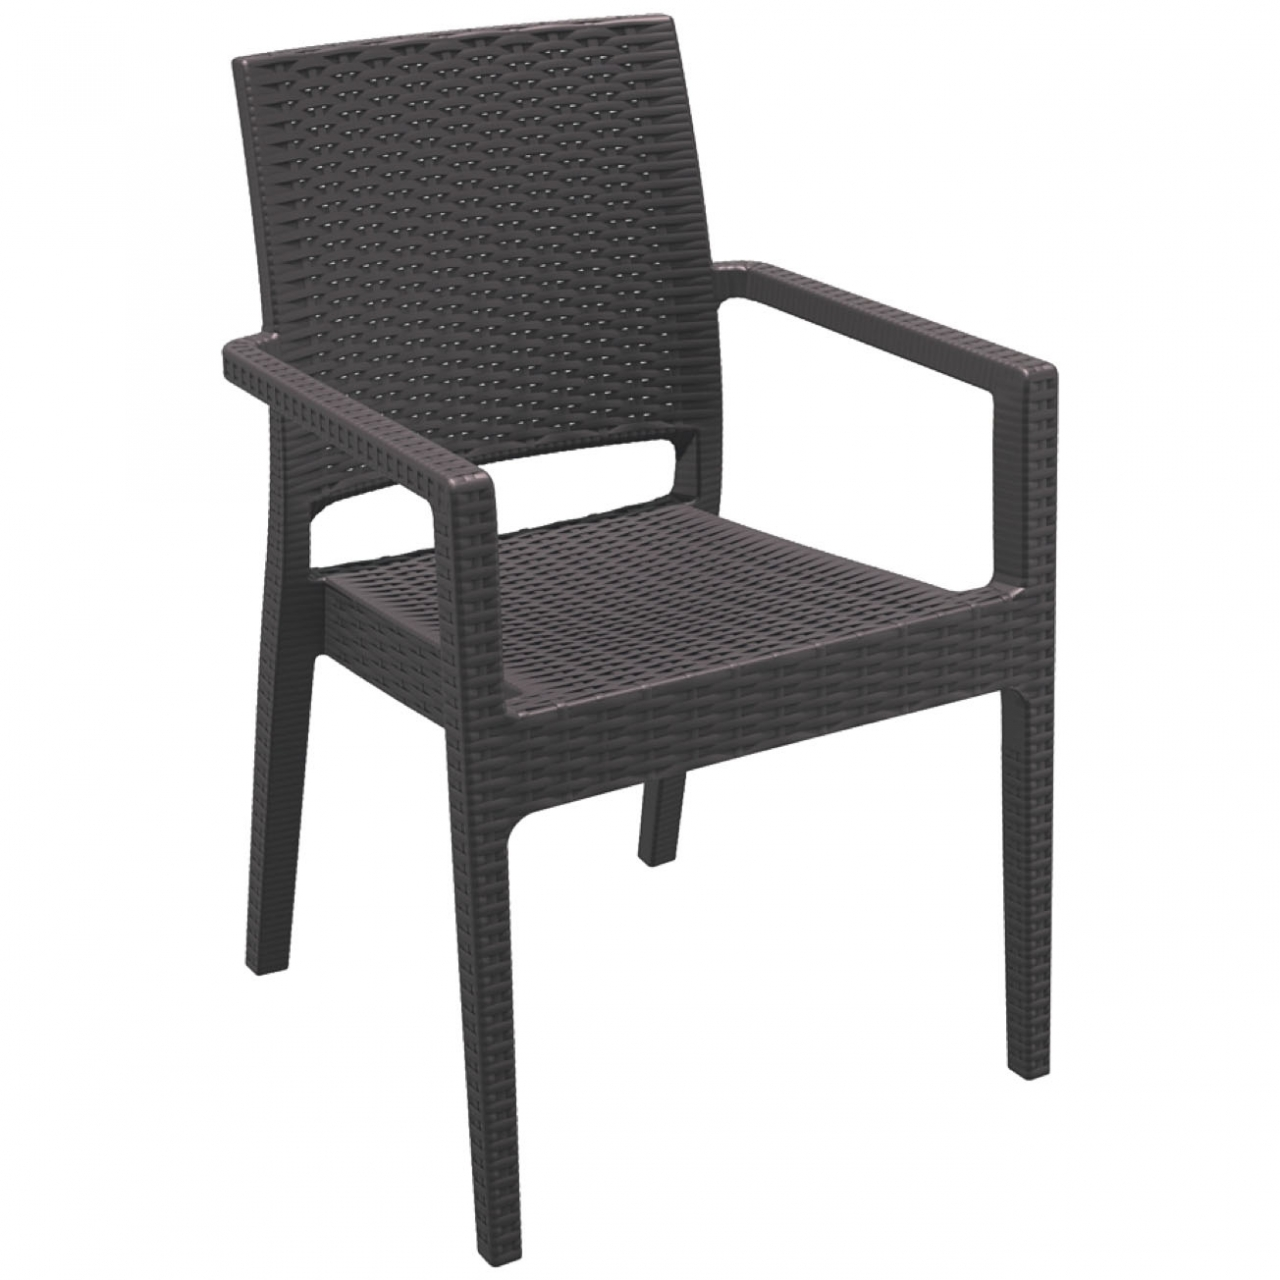 mobilier coulomb fauteuil de terrasse polypro jamaica mobilier terrasse de bar restaurant. Black Bedroom Furniture Sets. Home Design Ideas